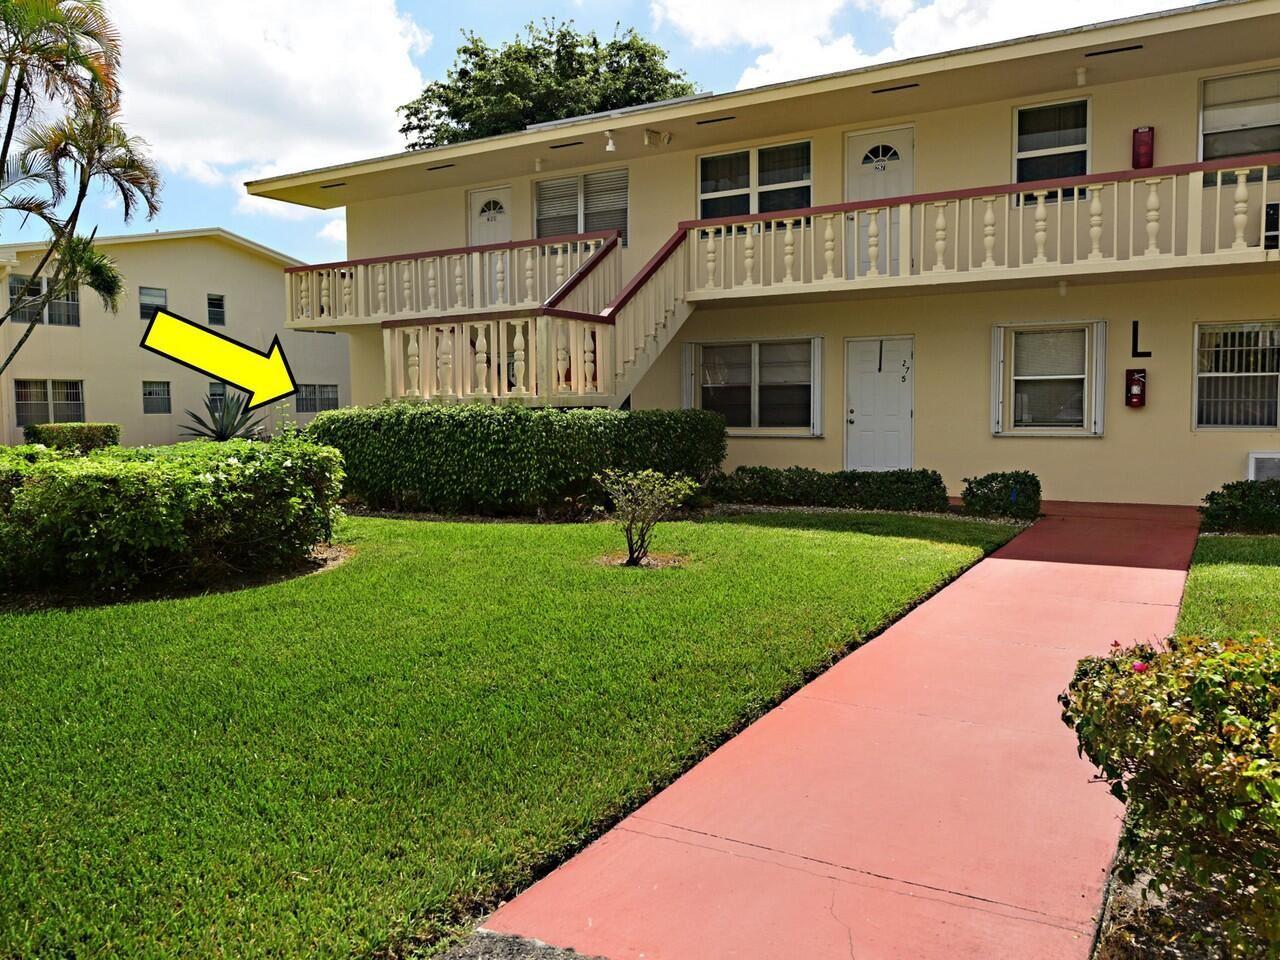 276 Coventry L, West Palm Beach, FL 33417 - MLS#: RX-10751359